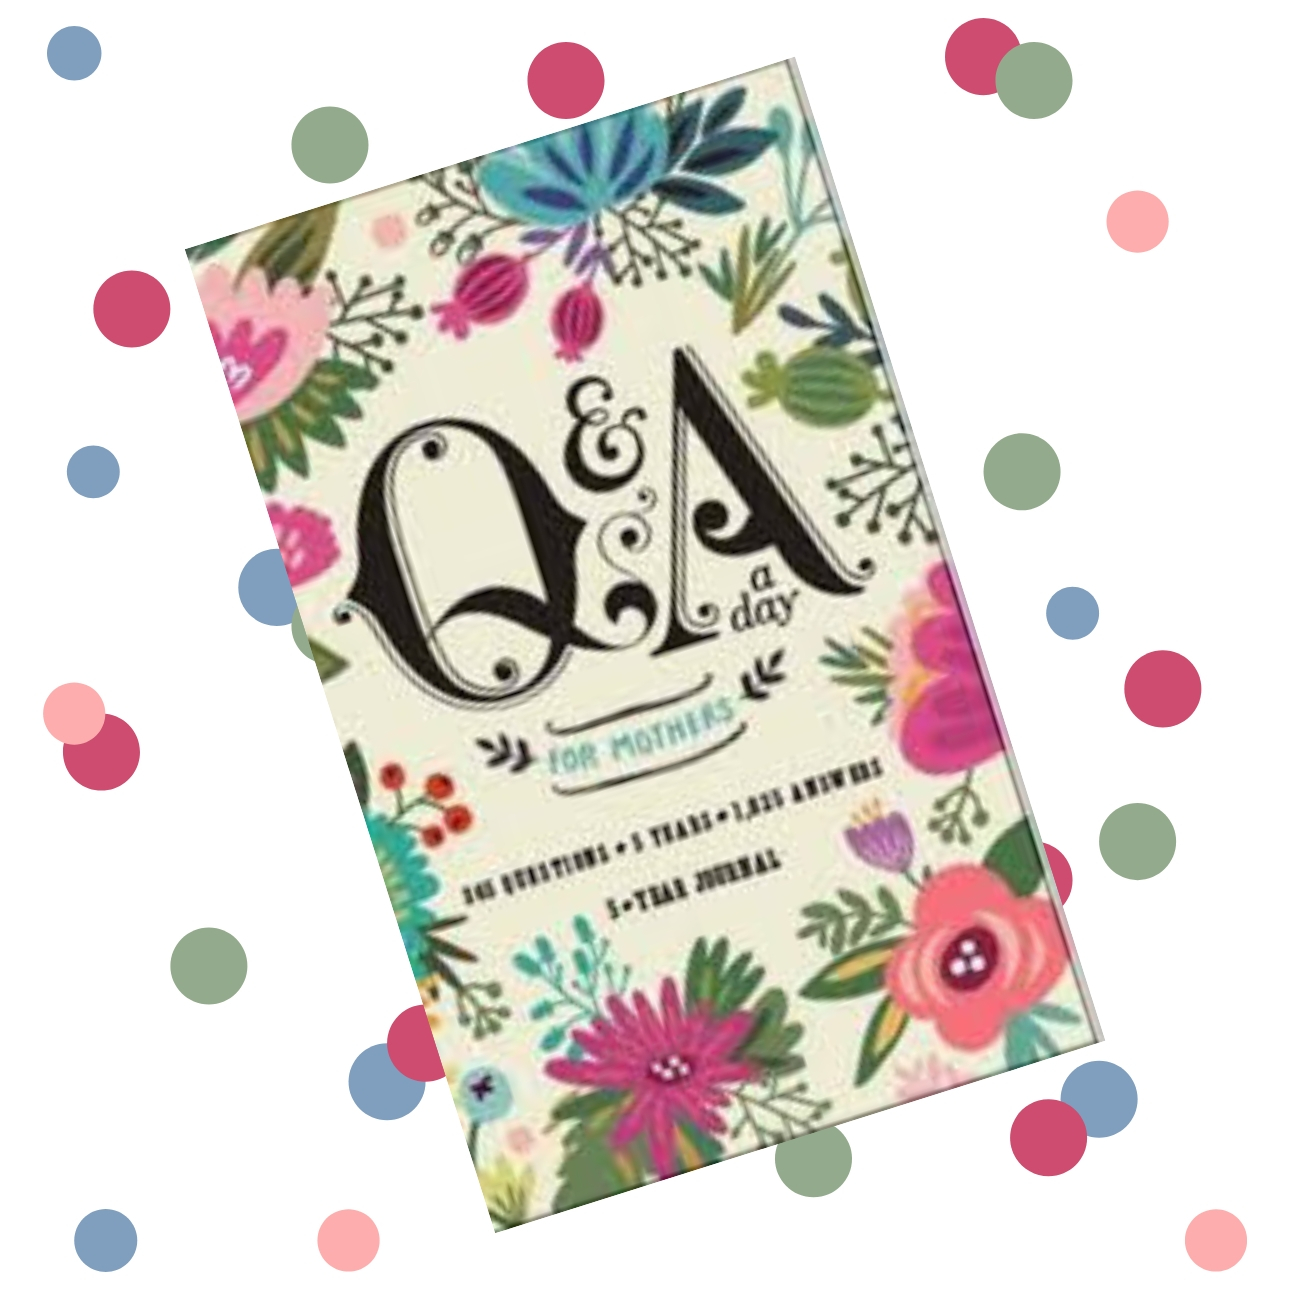 dagboeken wishlist - q&a a day for mothers